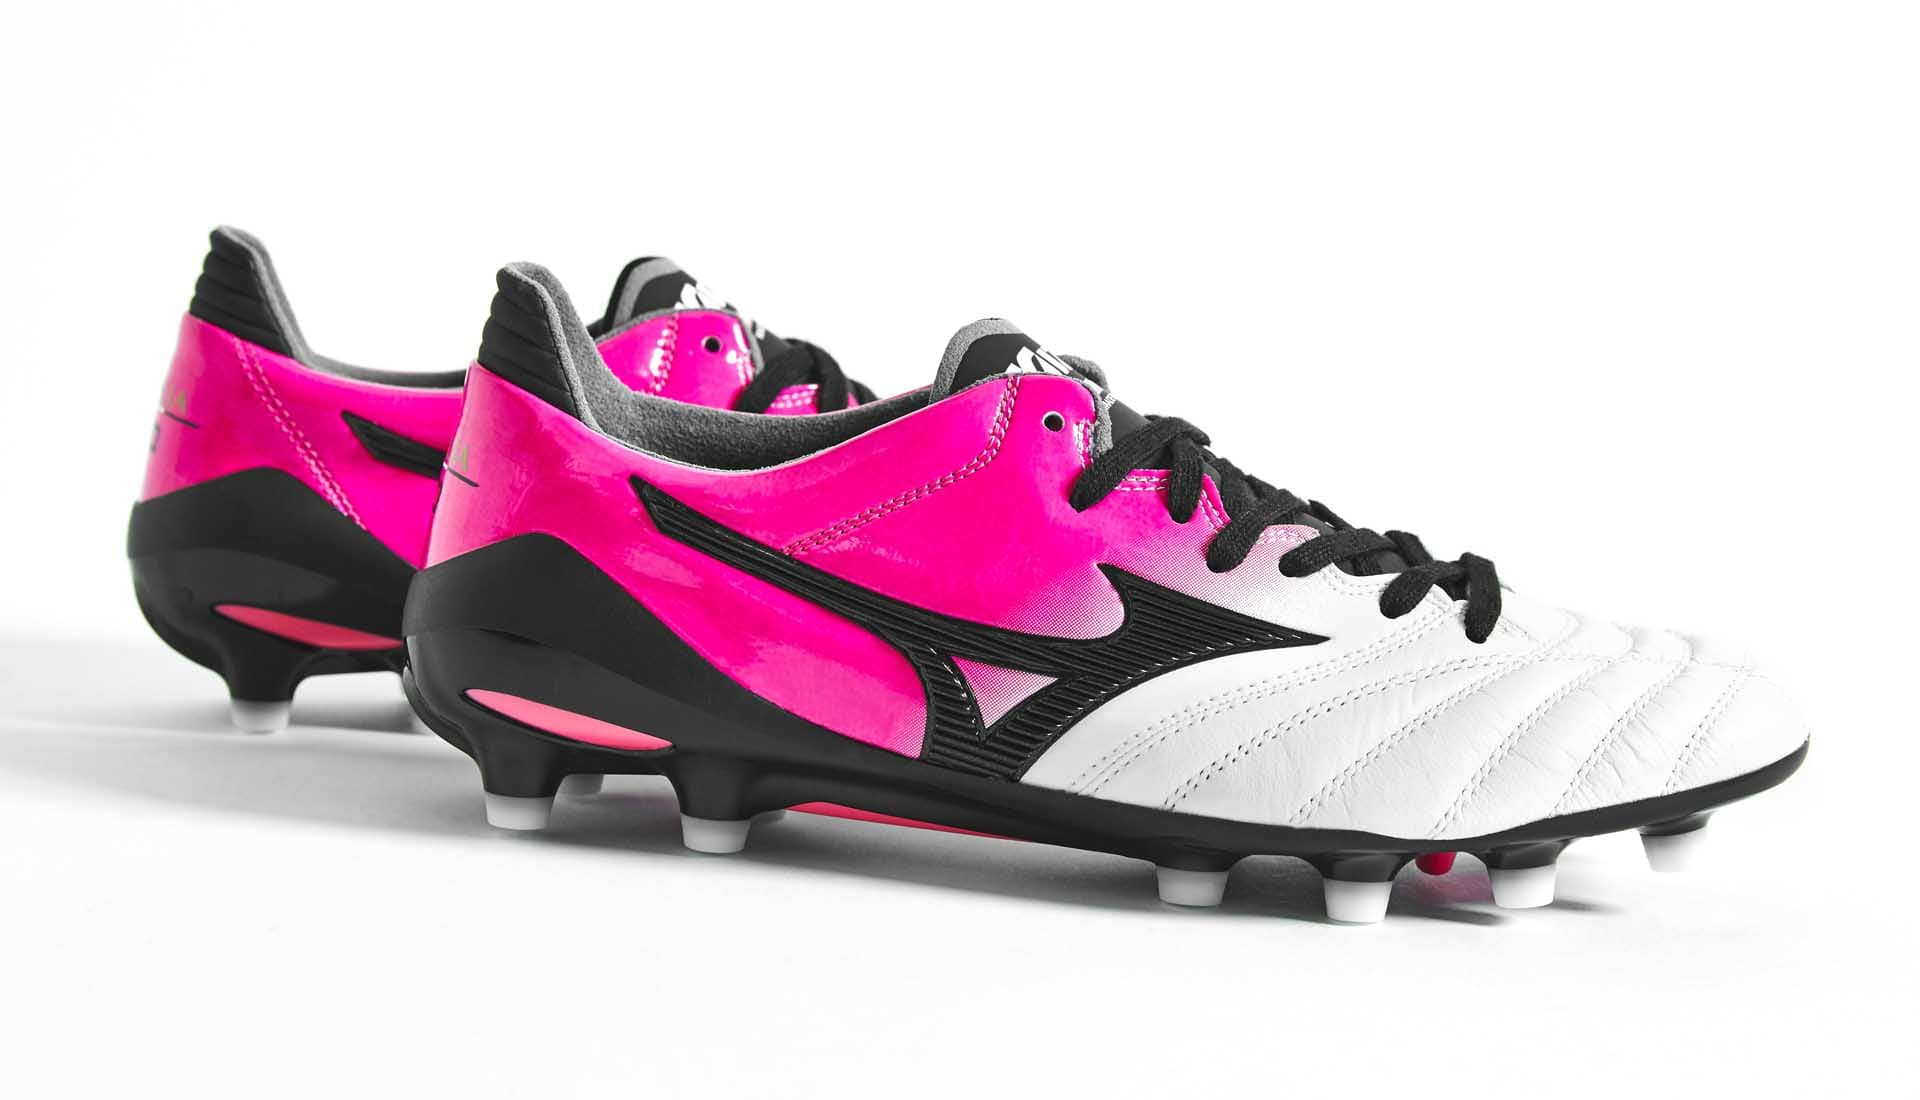 big sale 5184d 69669 Mizuno Morelia Neo II Made In Japan Football Boots - SoccerBible